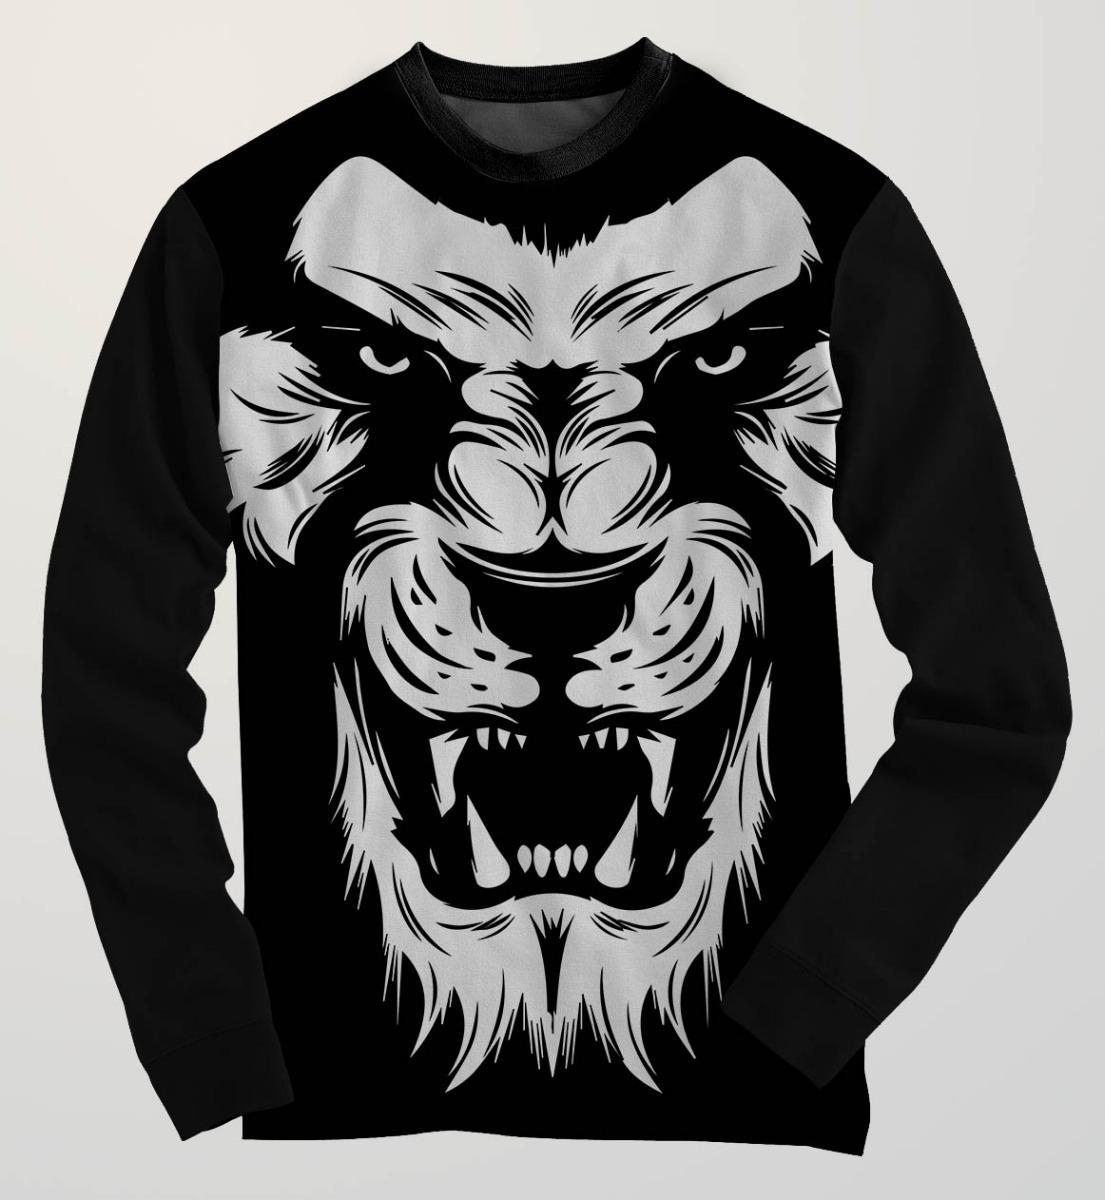 Blusa Moletom Leao Lion Black Desenho Dark Rock Tumblr Swag R